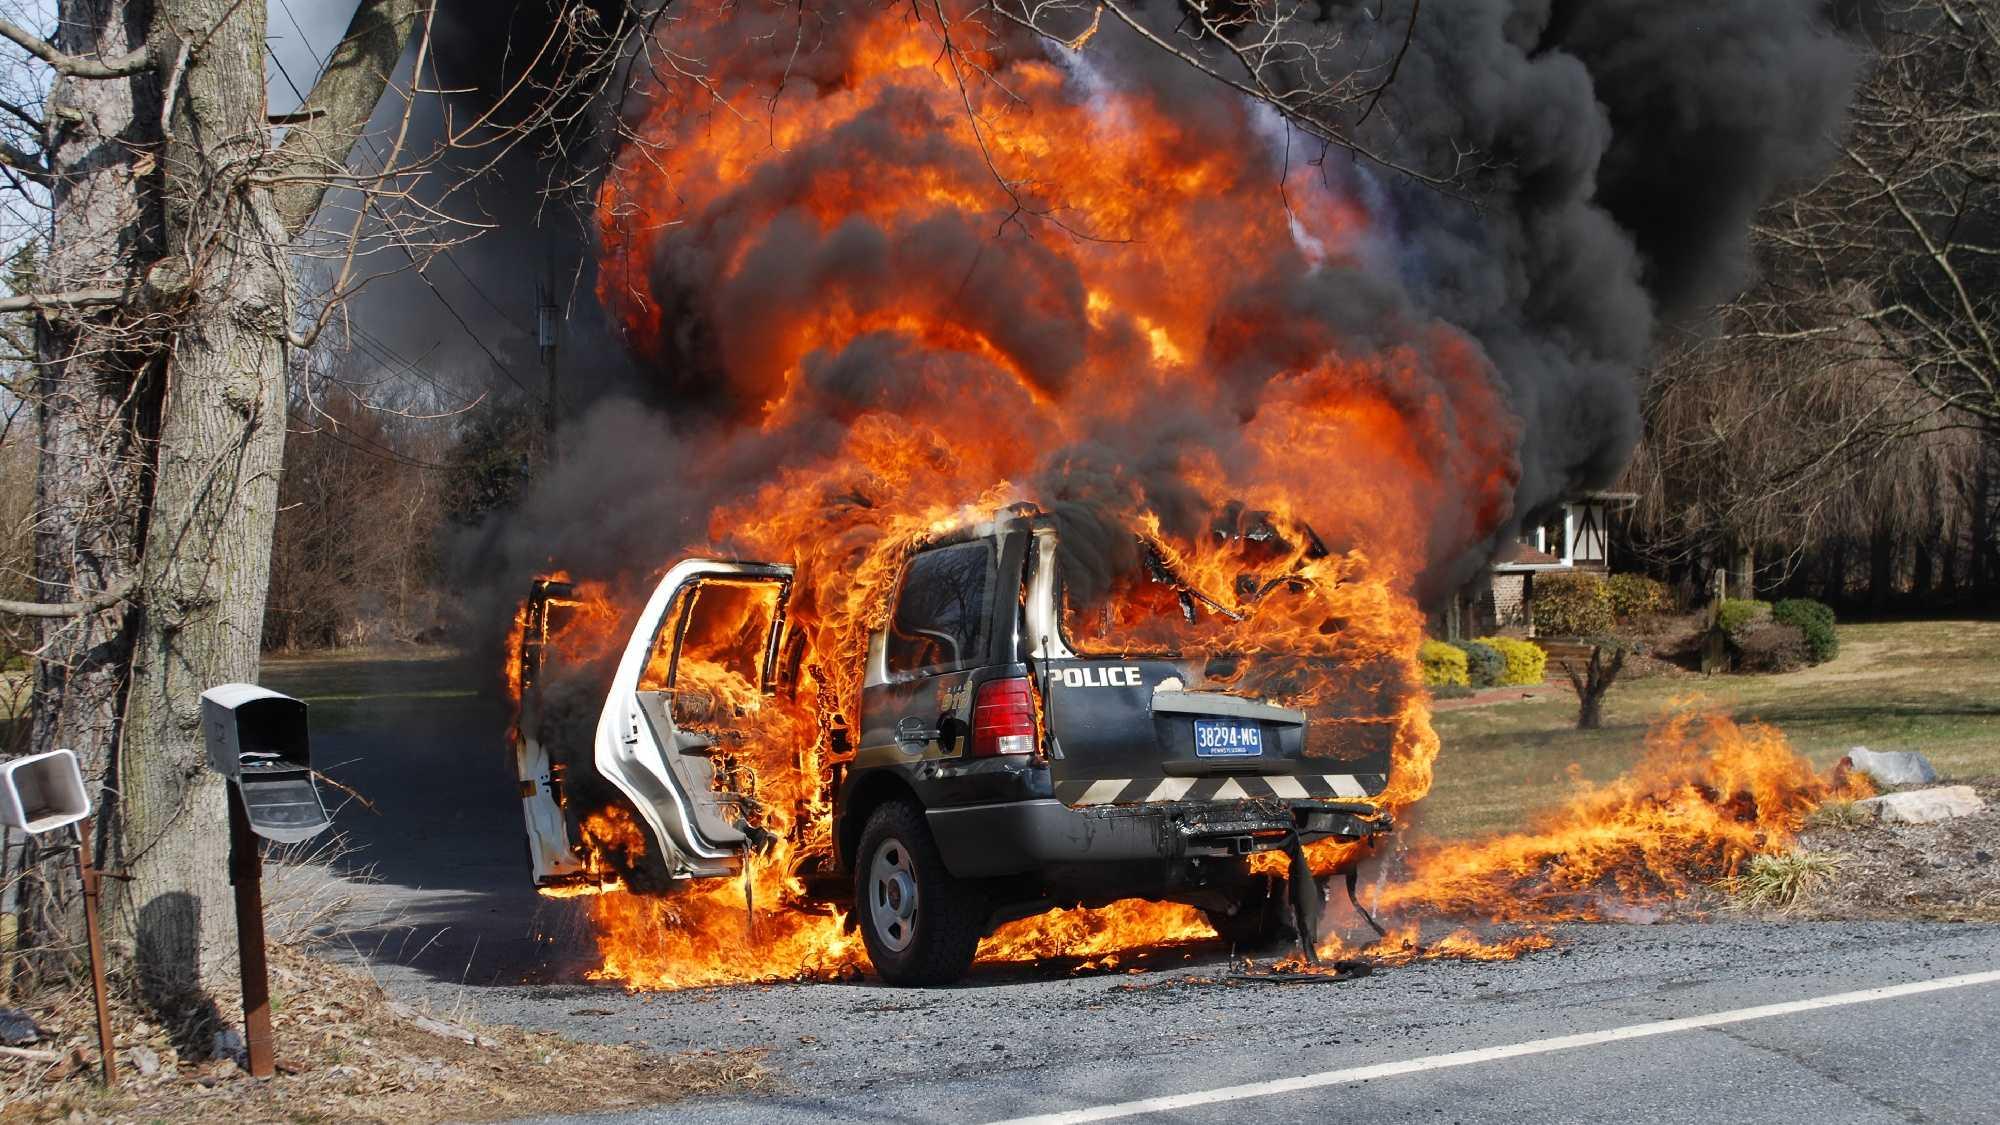 insane fire pic 3.8.16.JPG